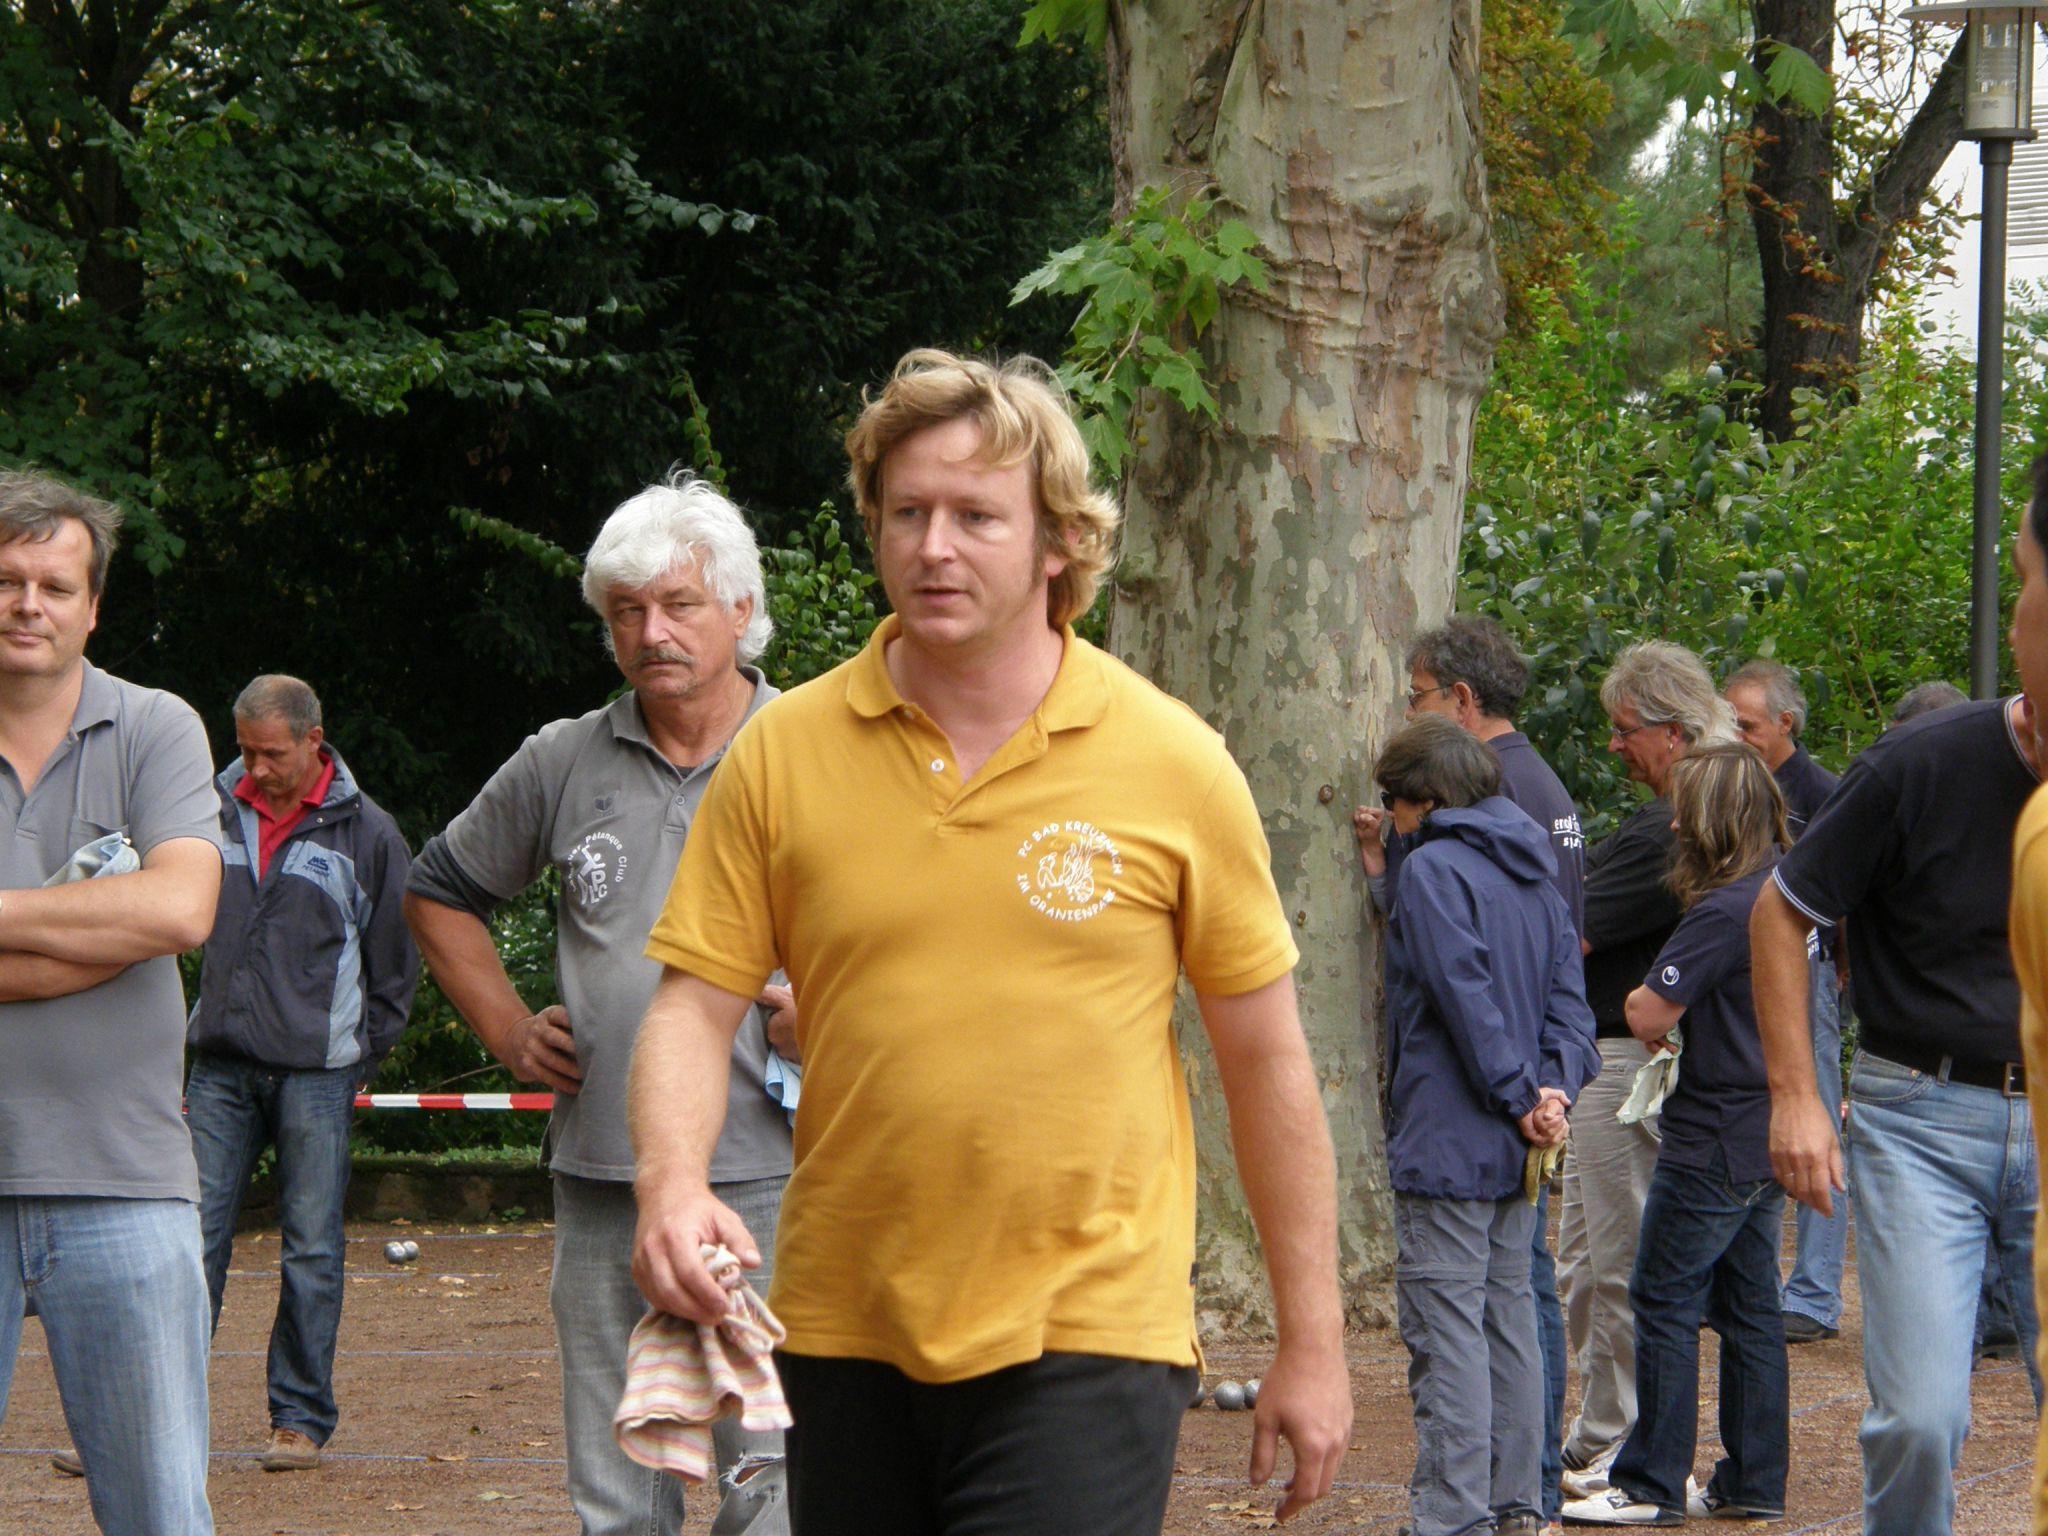 Landesliga08_Oranienpark_282529